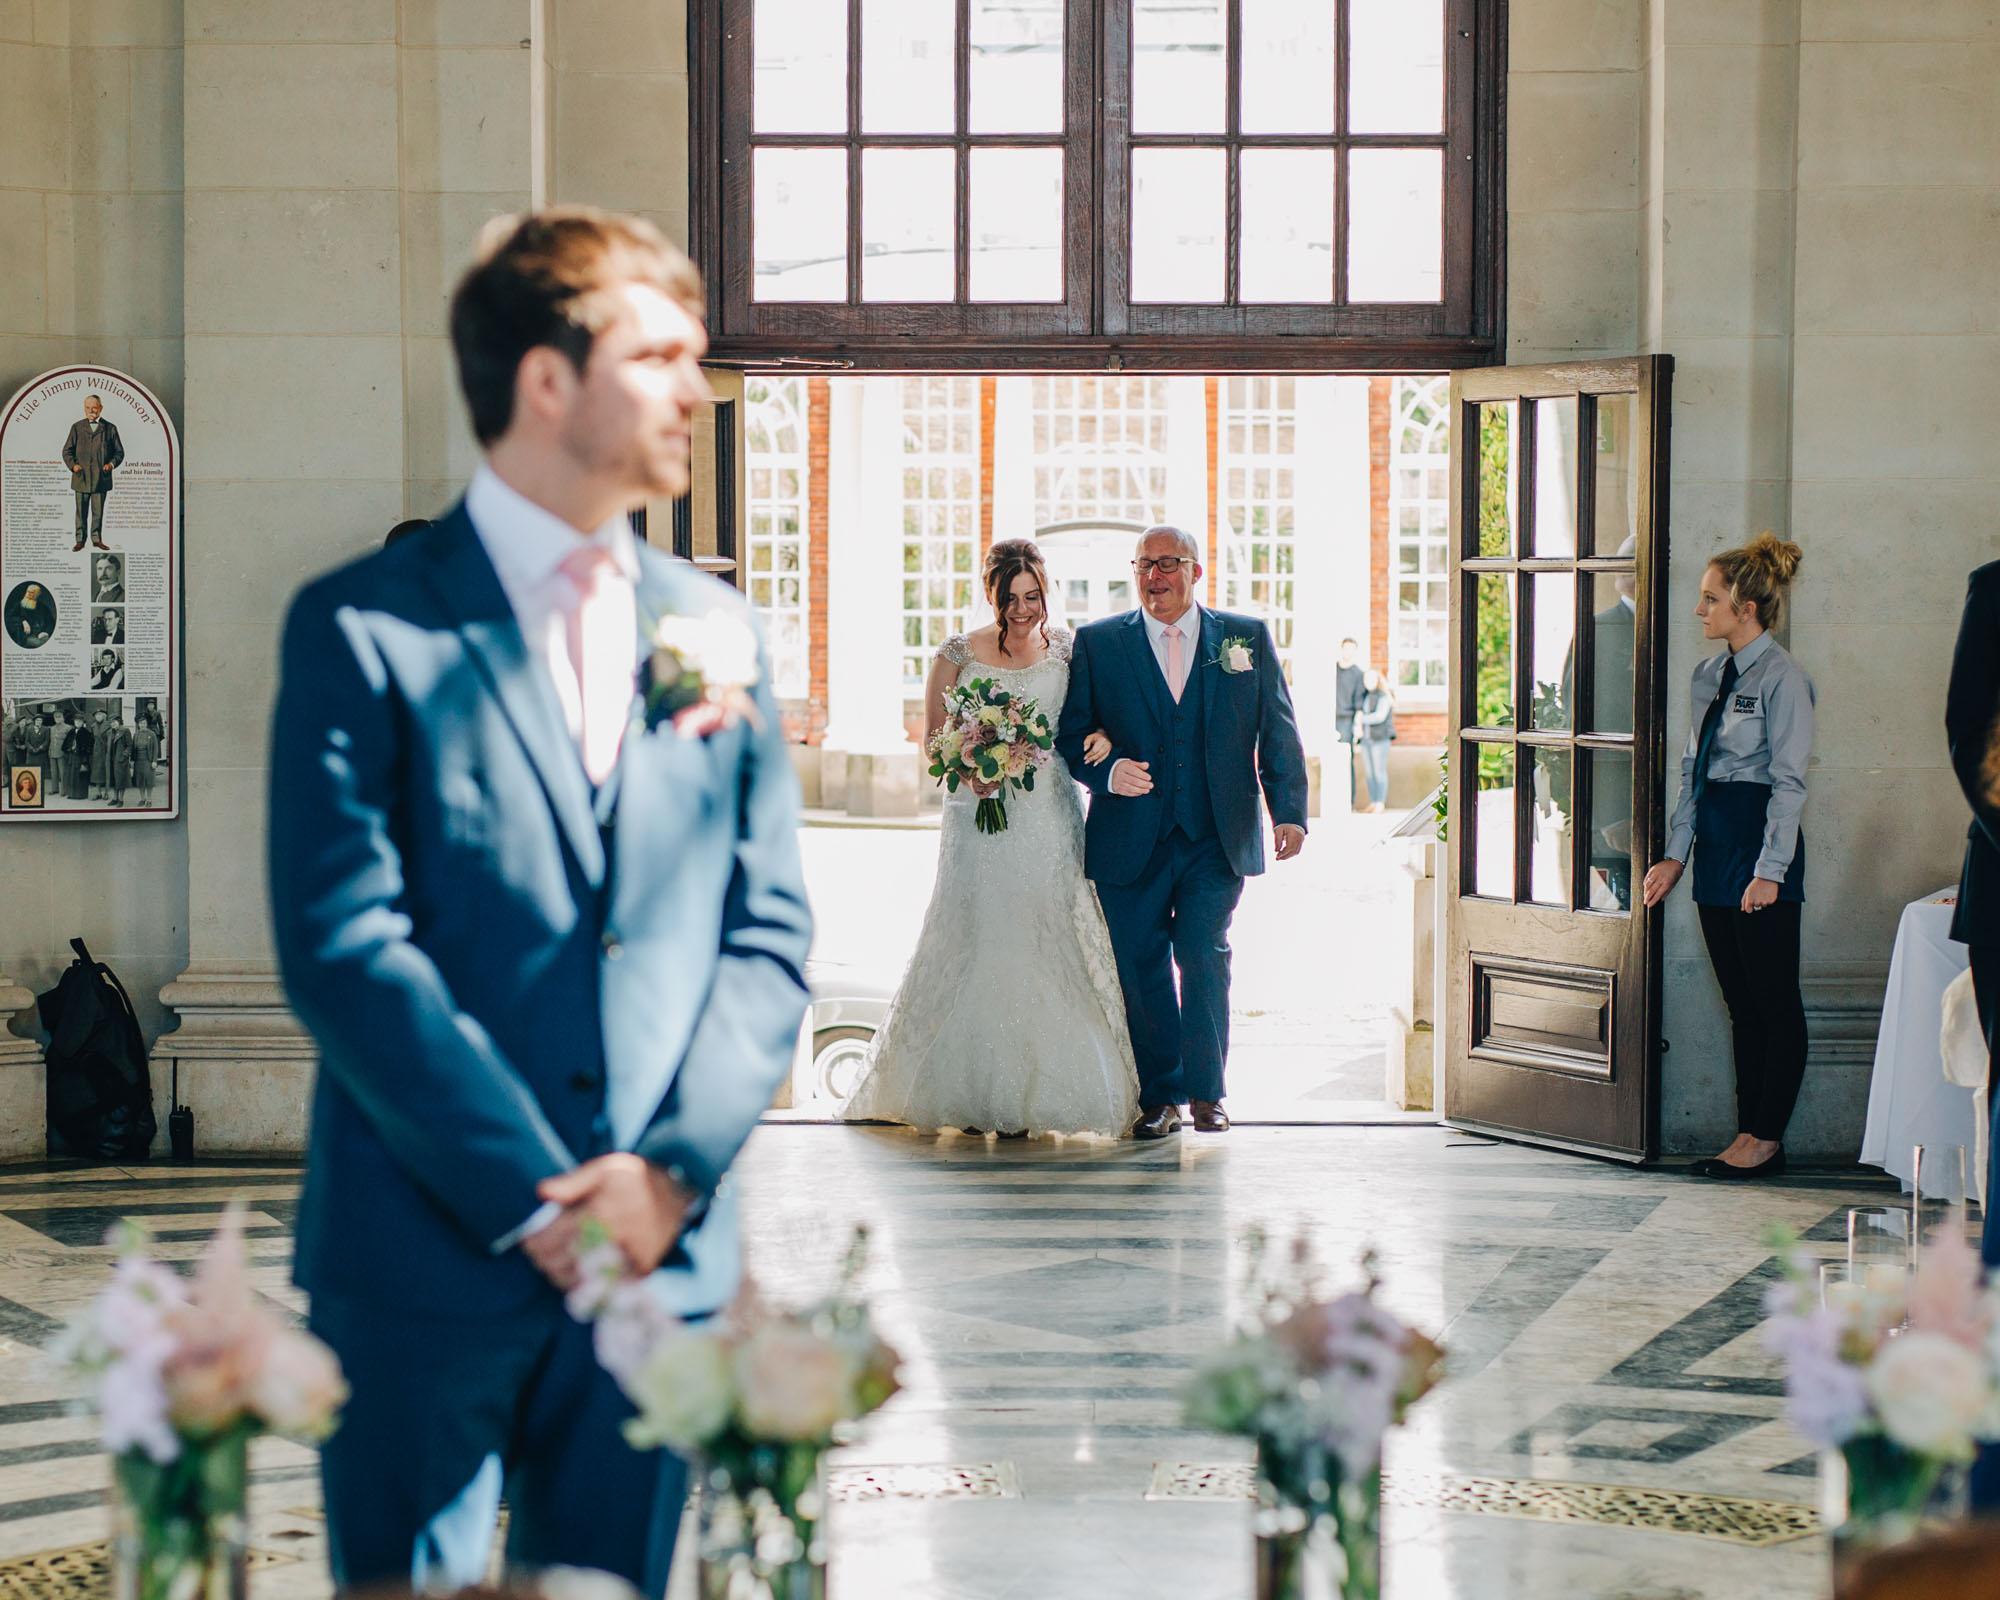 Lancashire wedding photographer - bride arrives at Ashton Memorial wedding